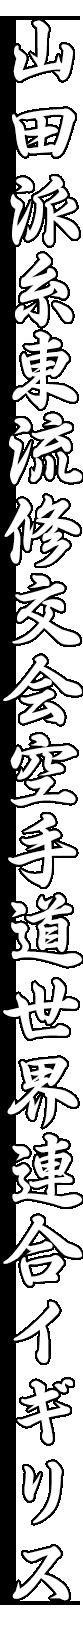 05---yssku_kanji_wht_thick_vert